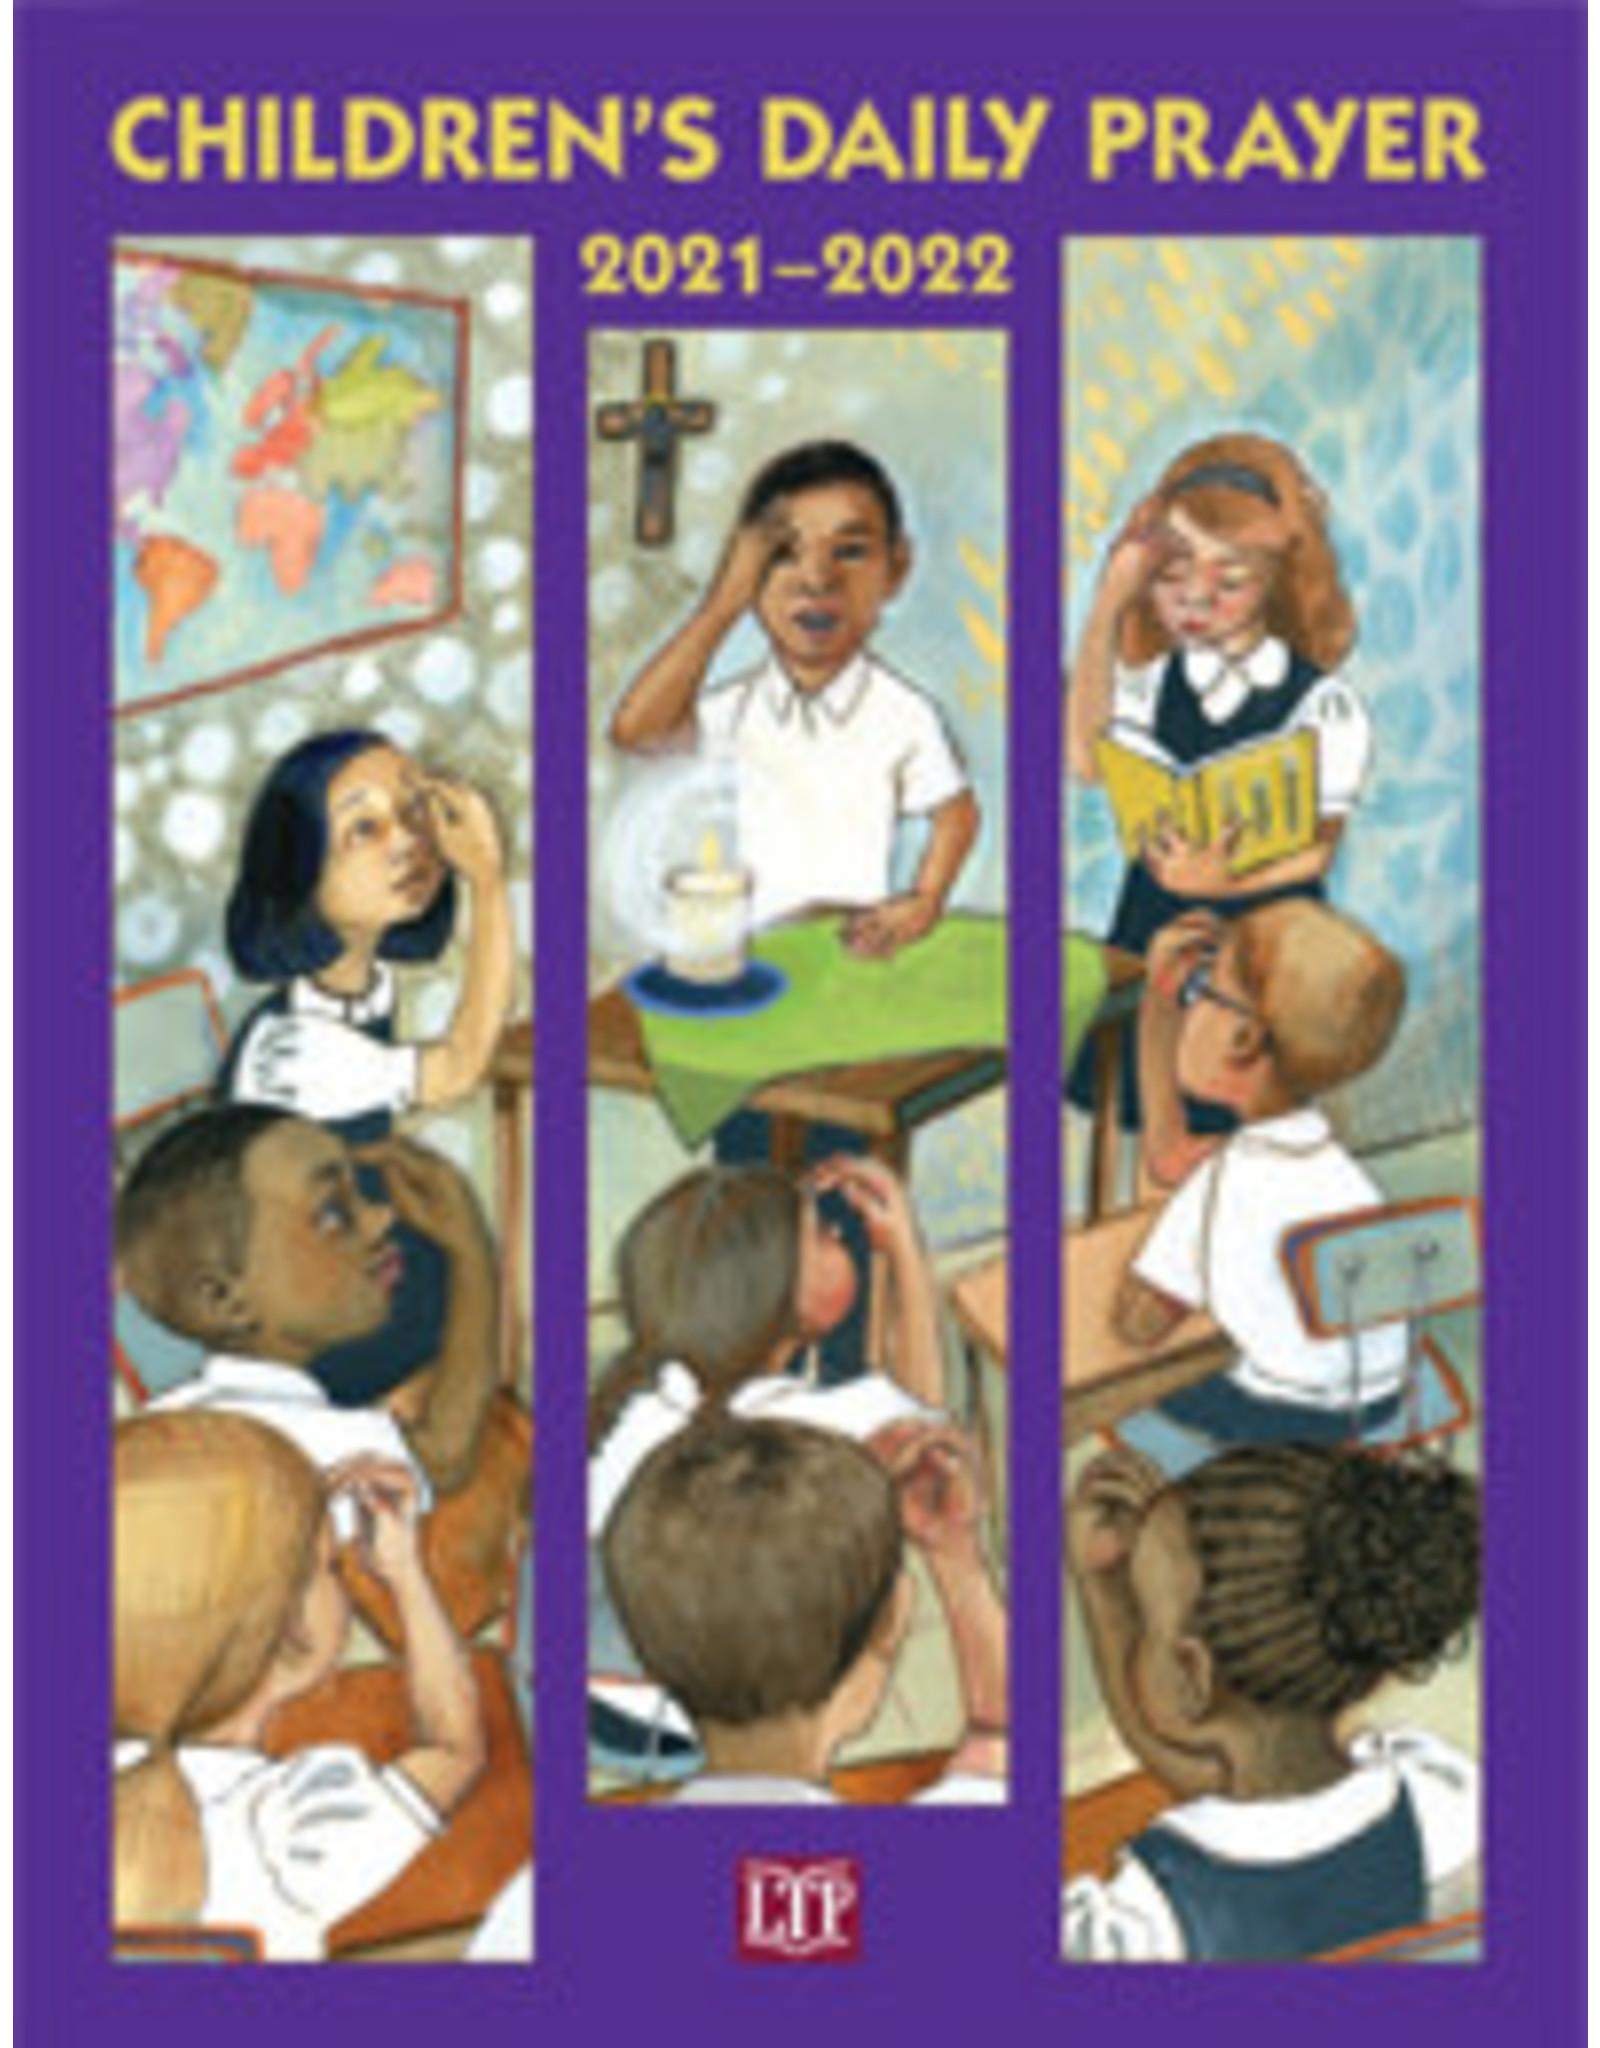 2021-22 Children's Daily Prayer